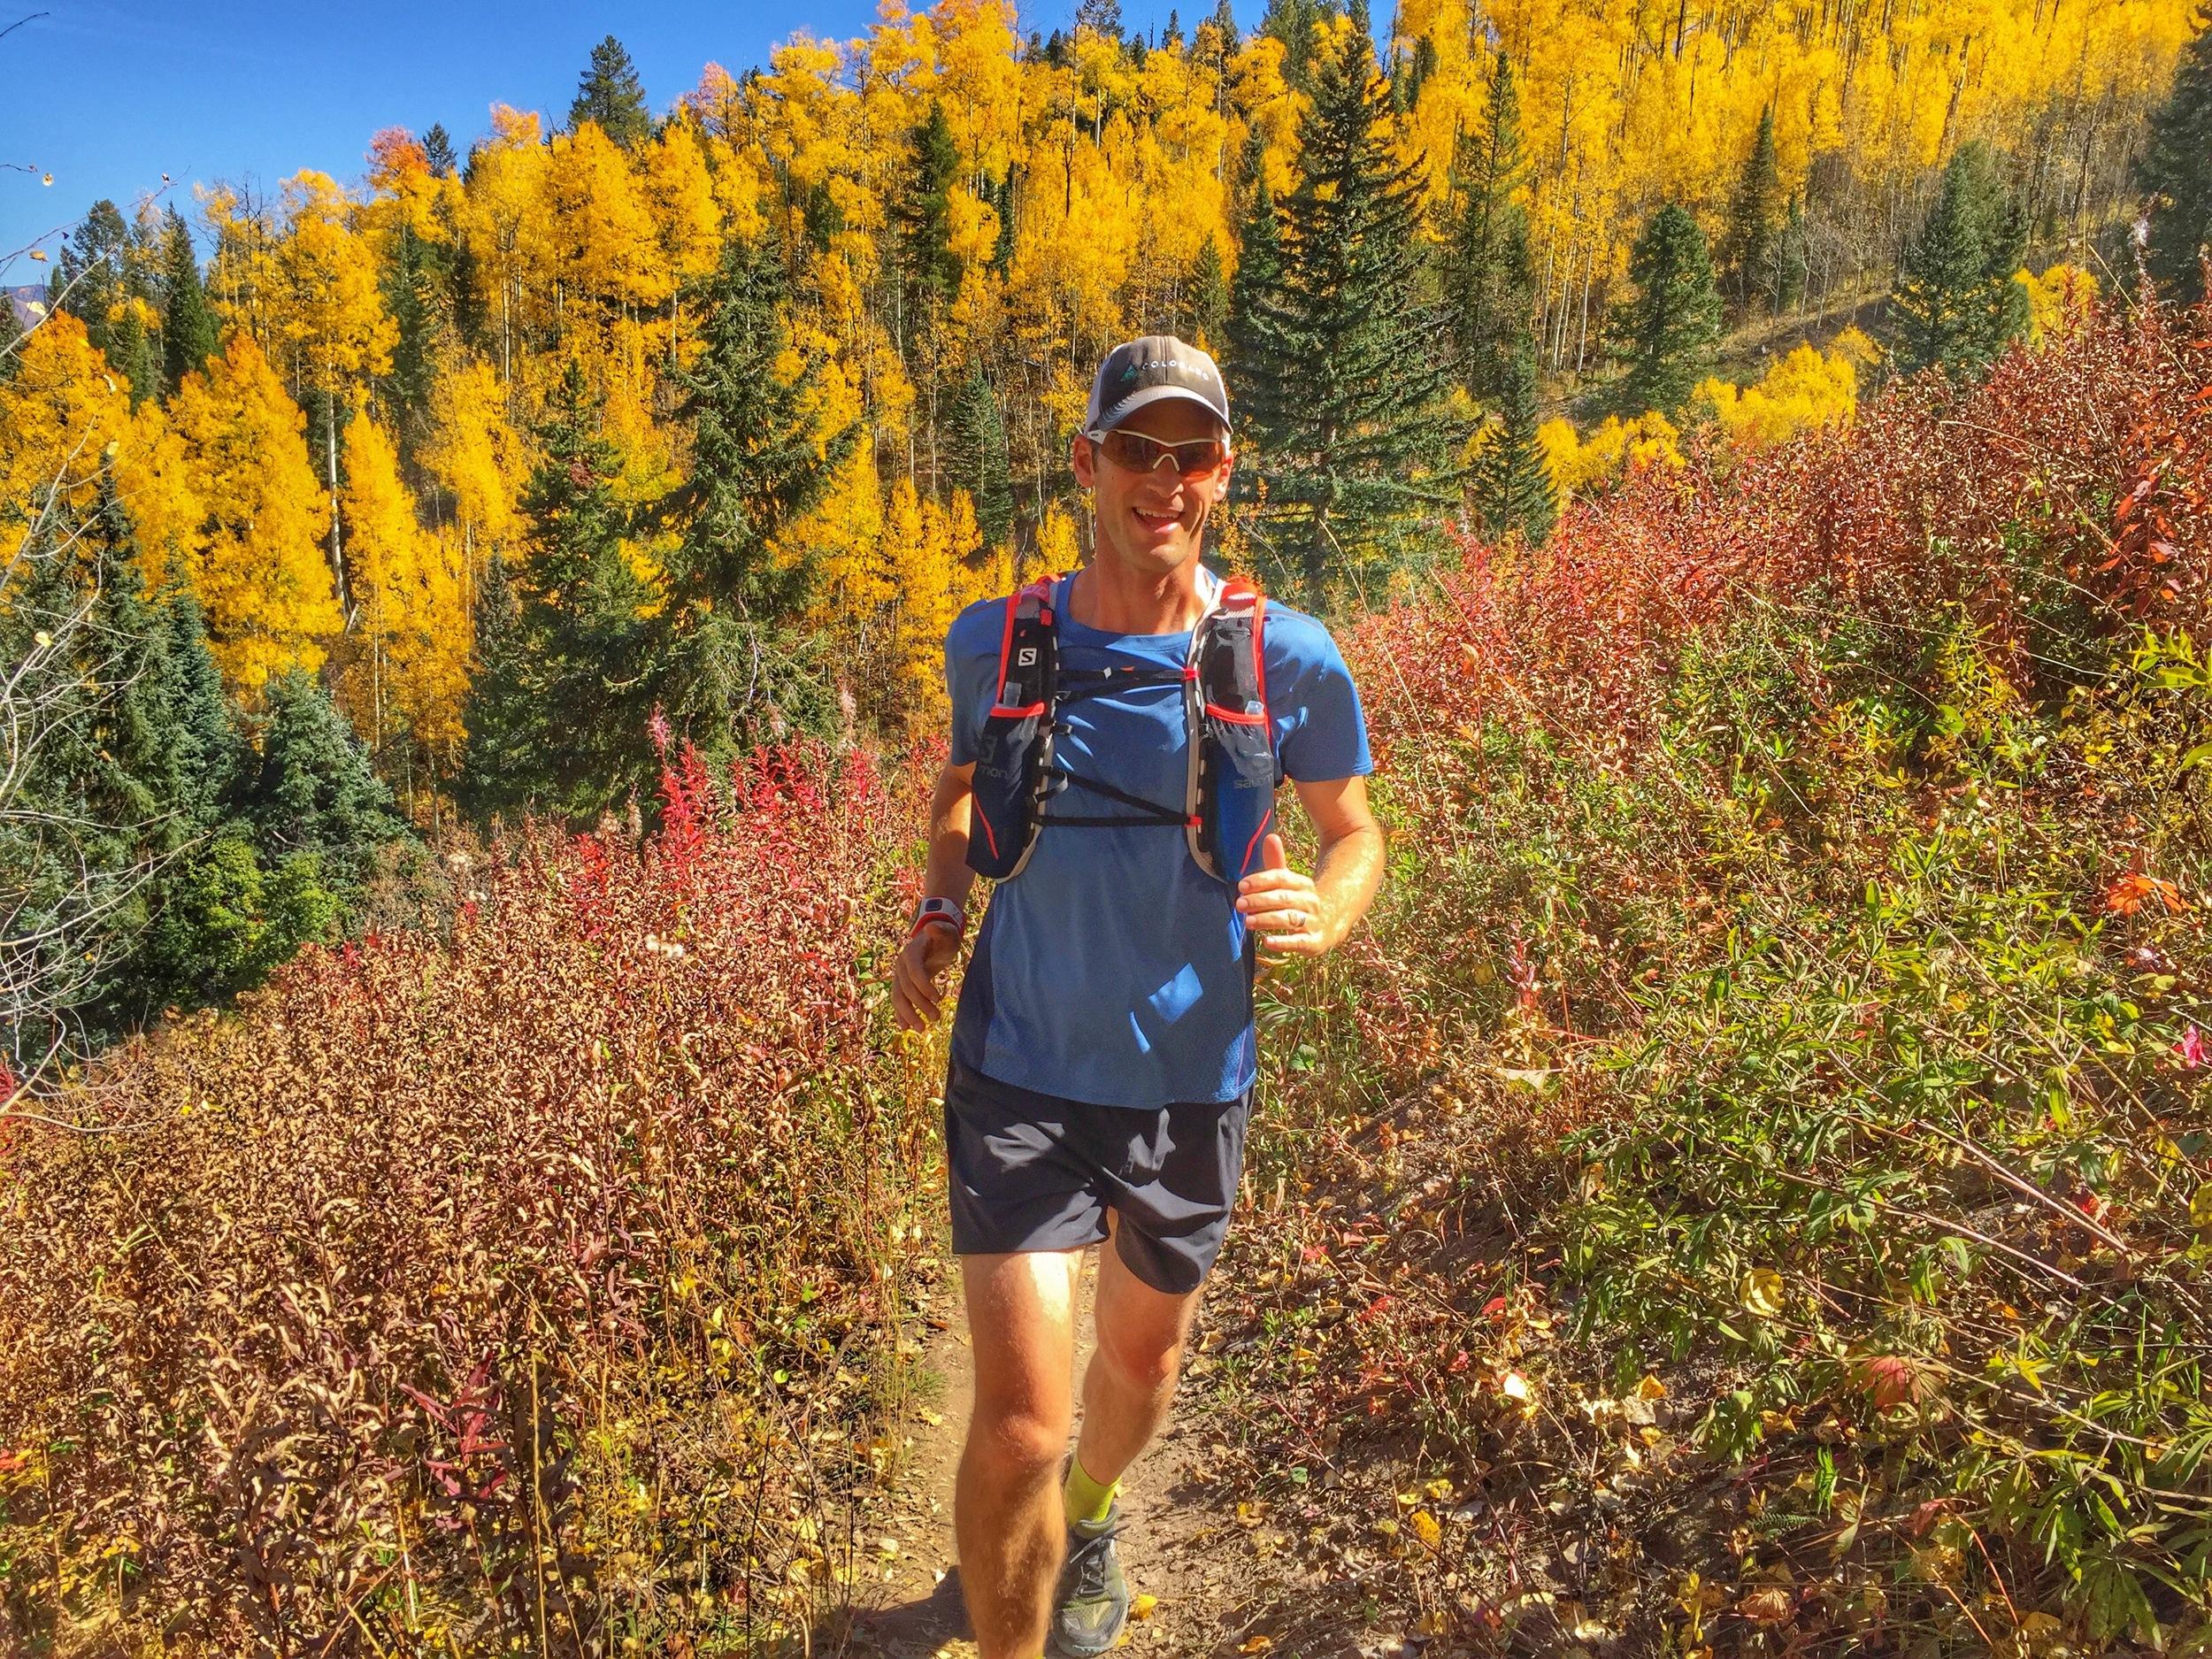 Golden Leaf Half Marathon Trail between Snowmass and Aspen.